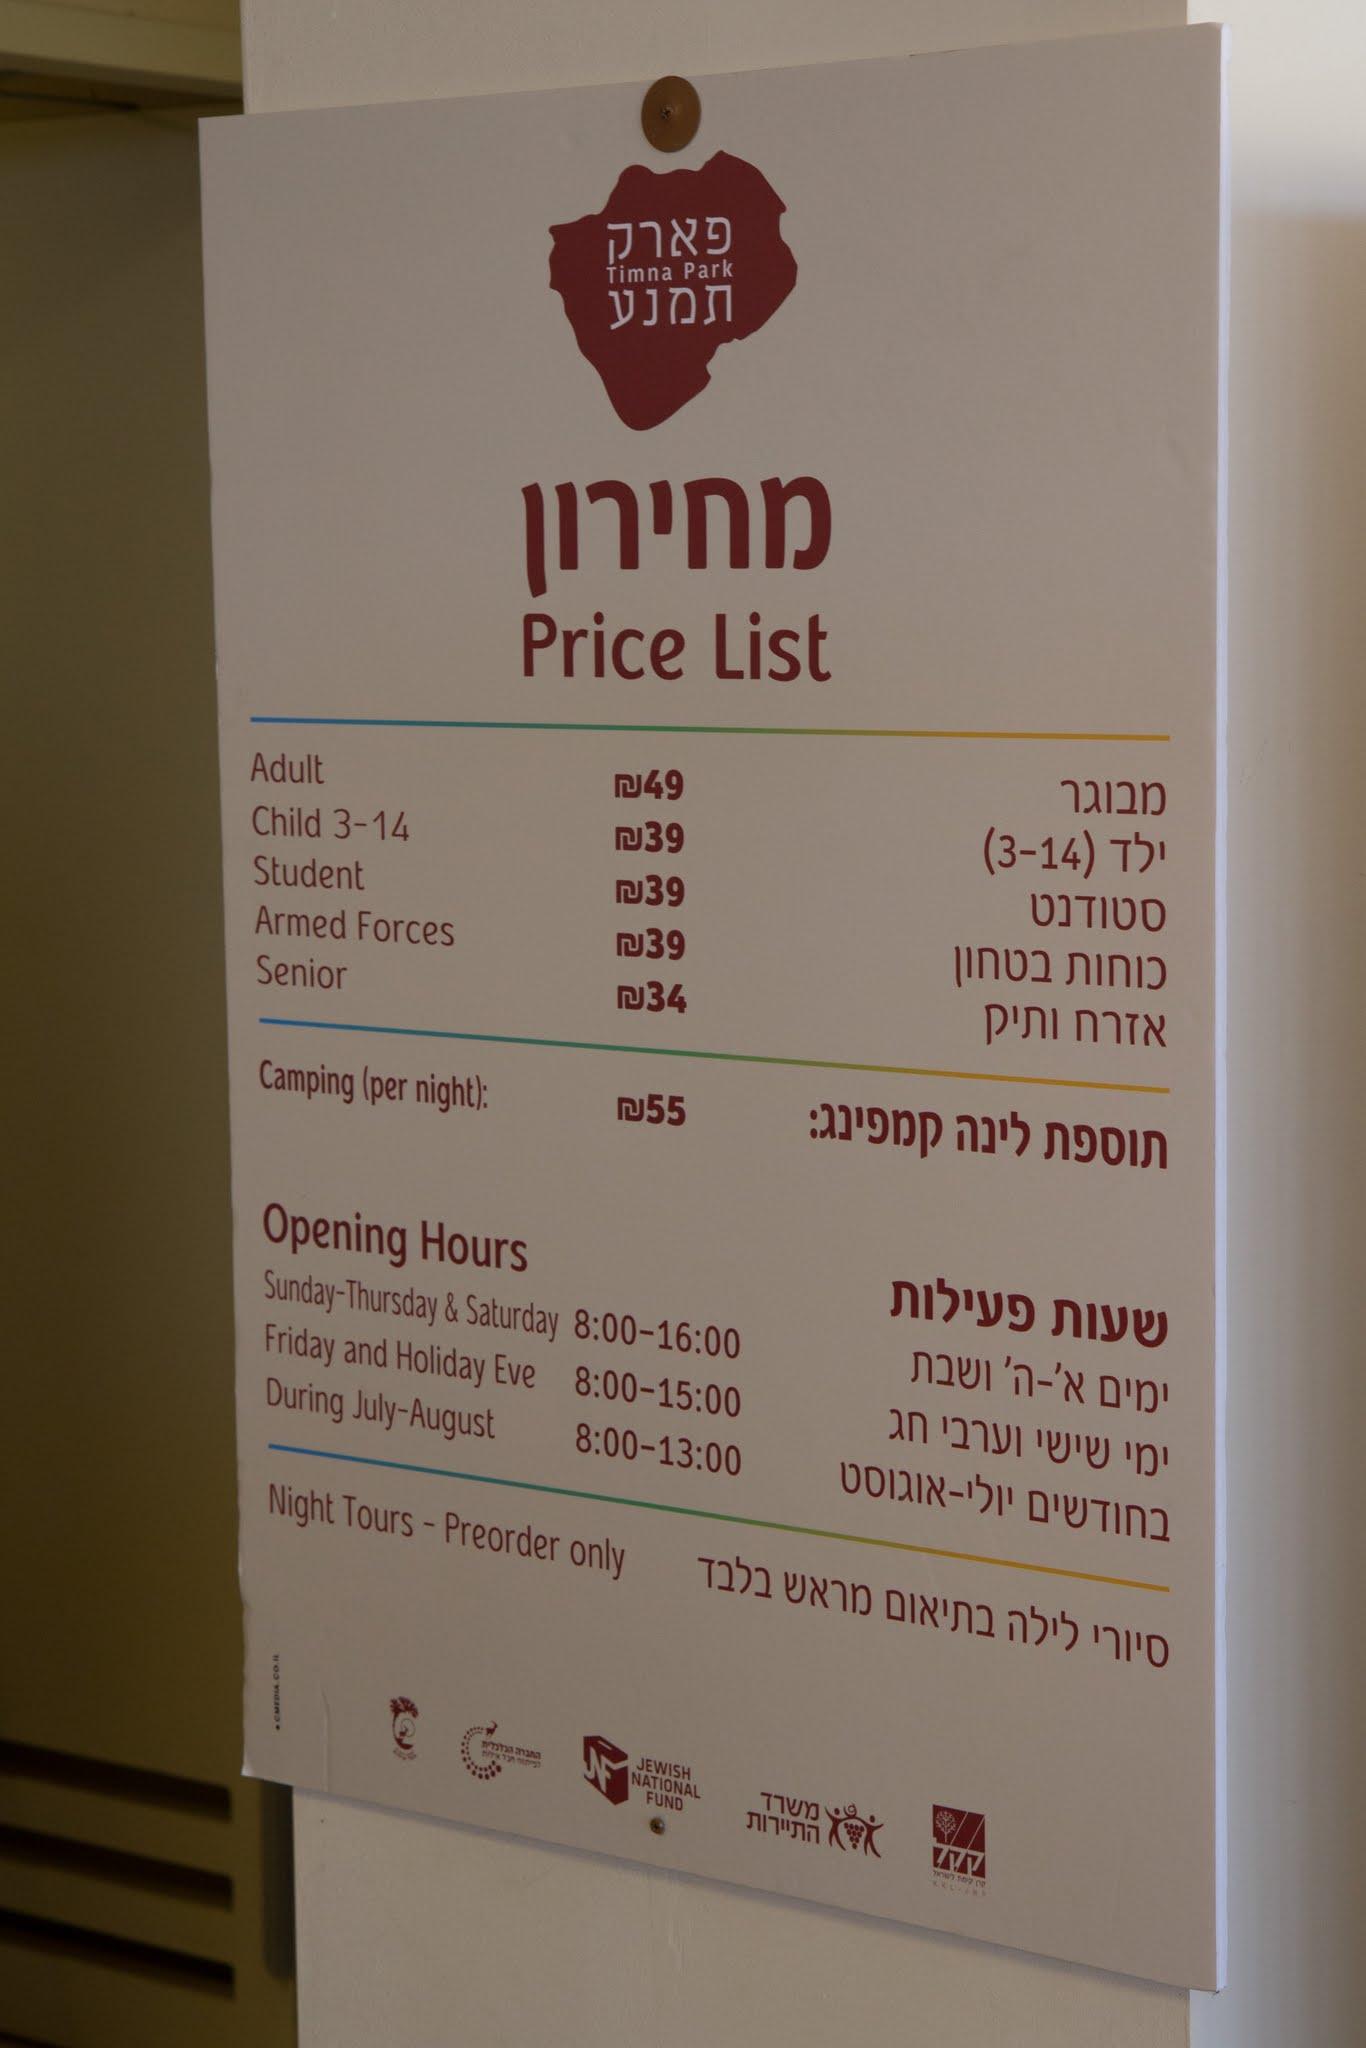 Timna Park w Izraelu, cennik biletów